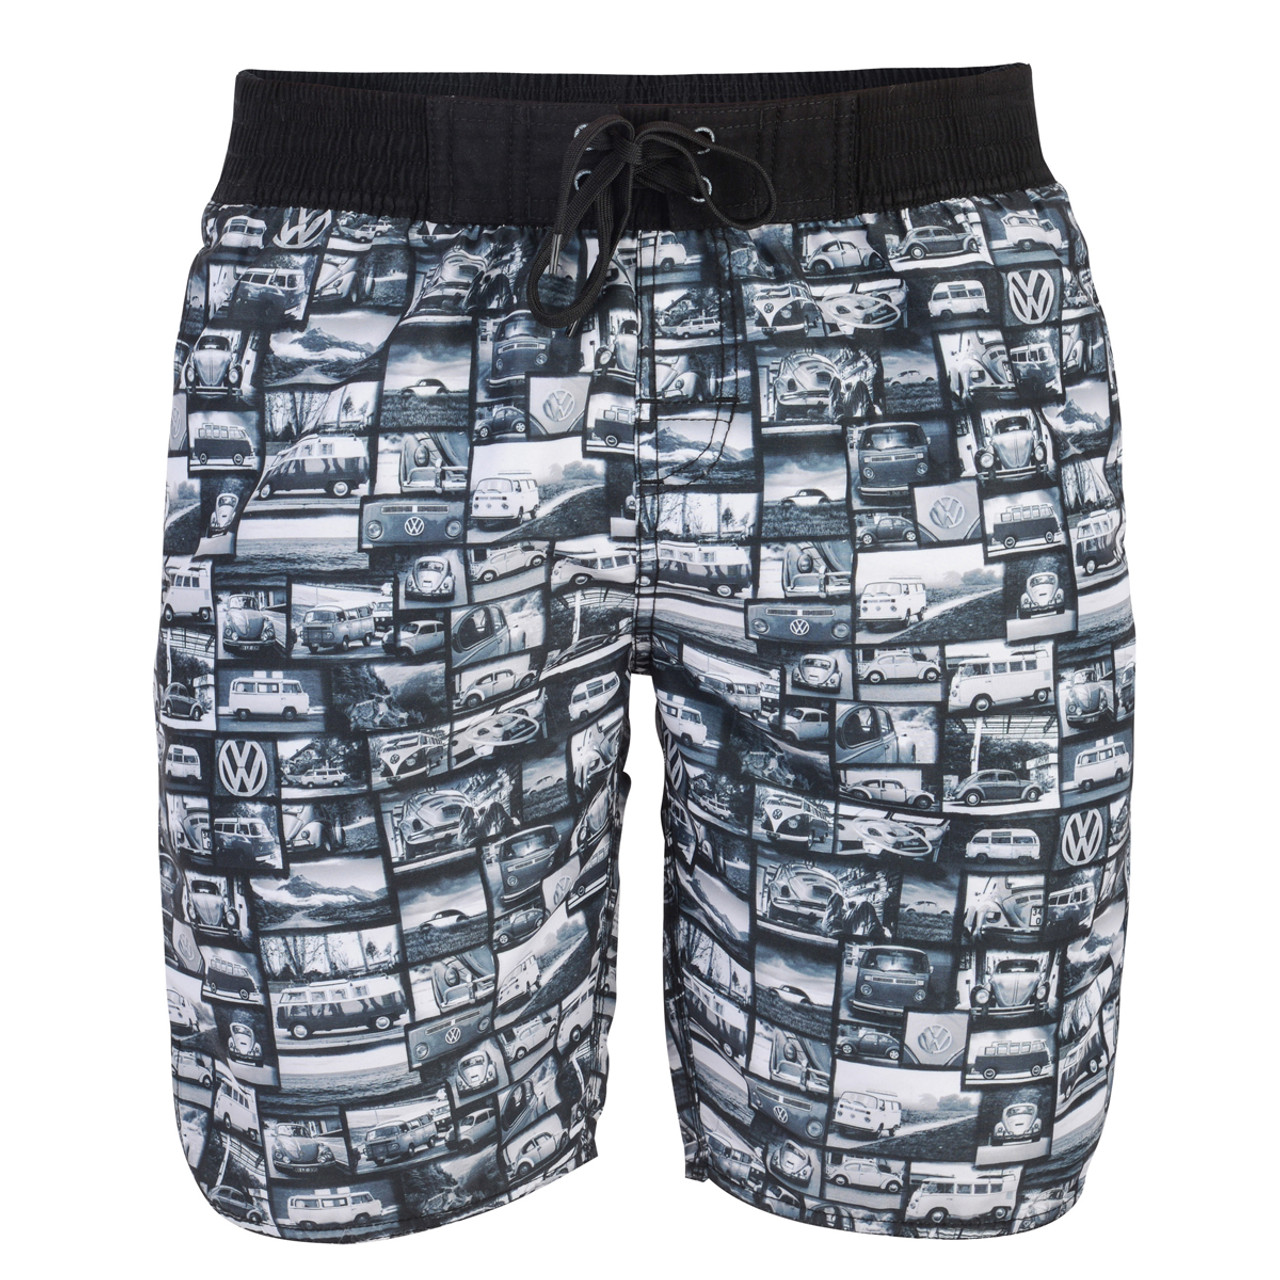 66f329c29c Volkswagen Campervan Mens Beach Shorts - Essential Beachwear